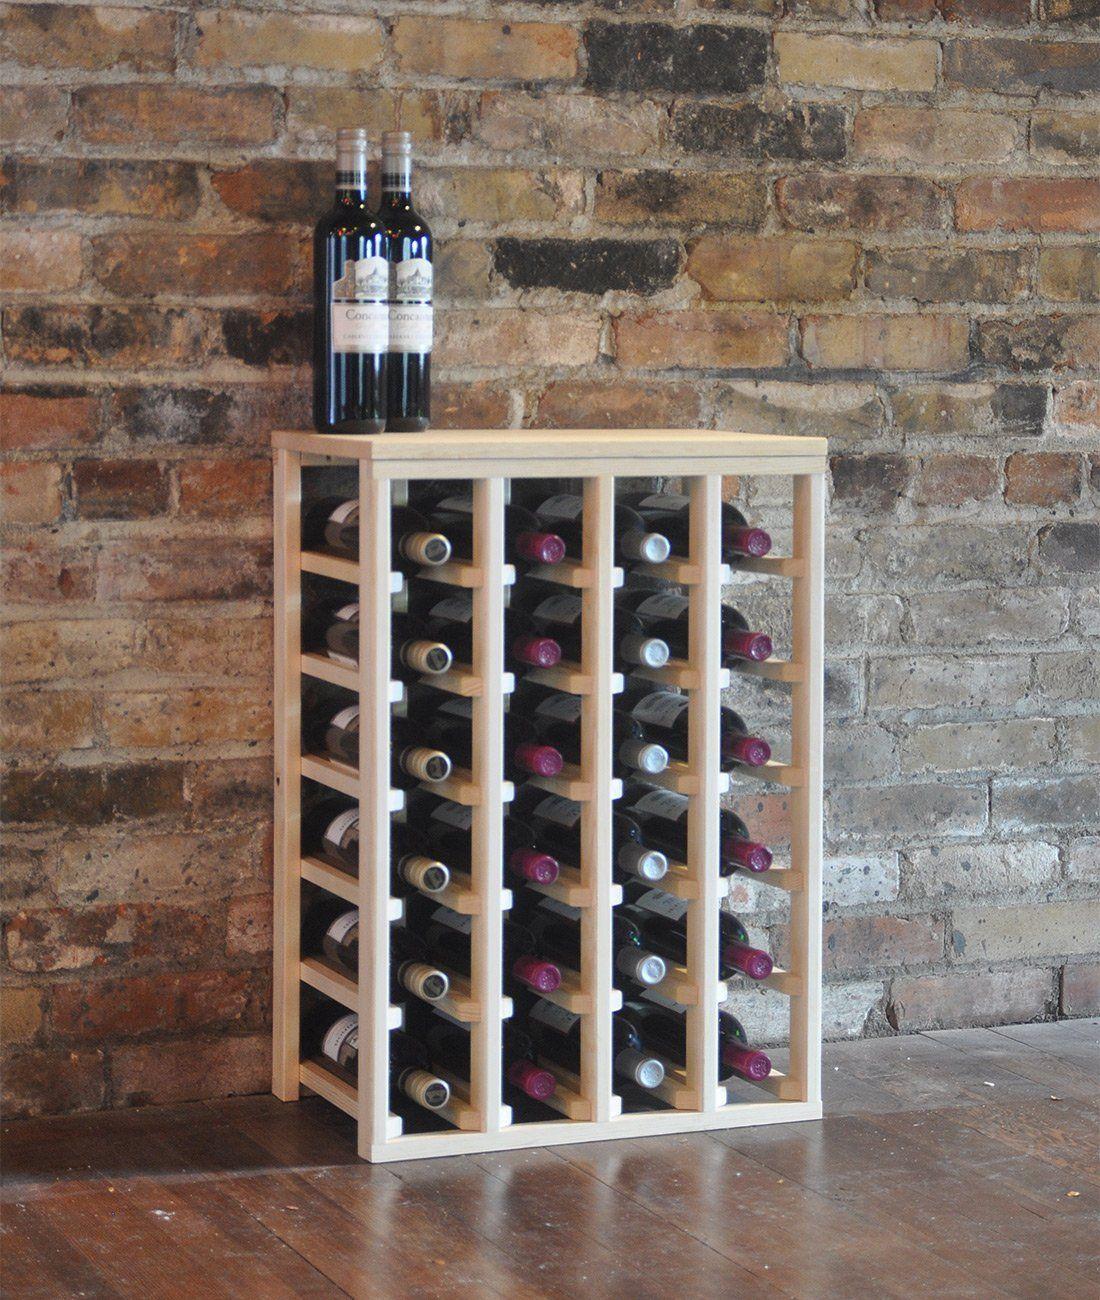 100 Creative Wine Racks And Wine Storage Ideas Ultimate Guide Wood Wine Racks Wine Storage Wine Rack Inspiration